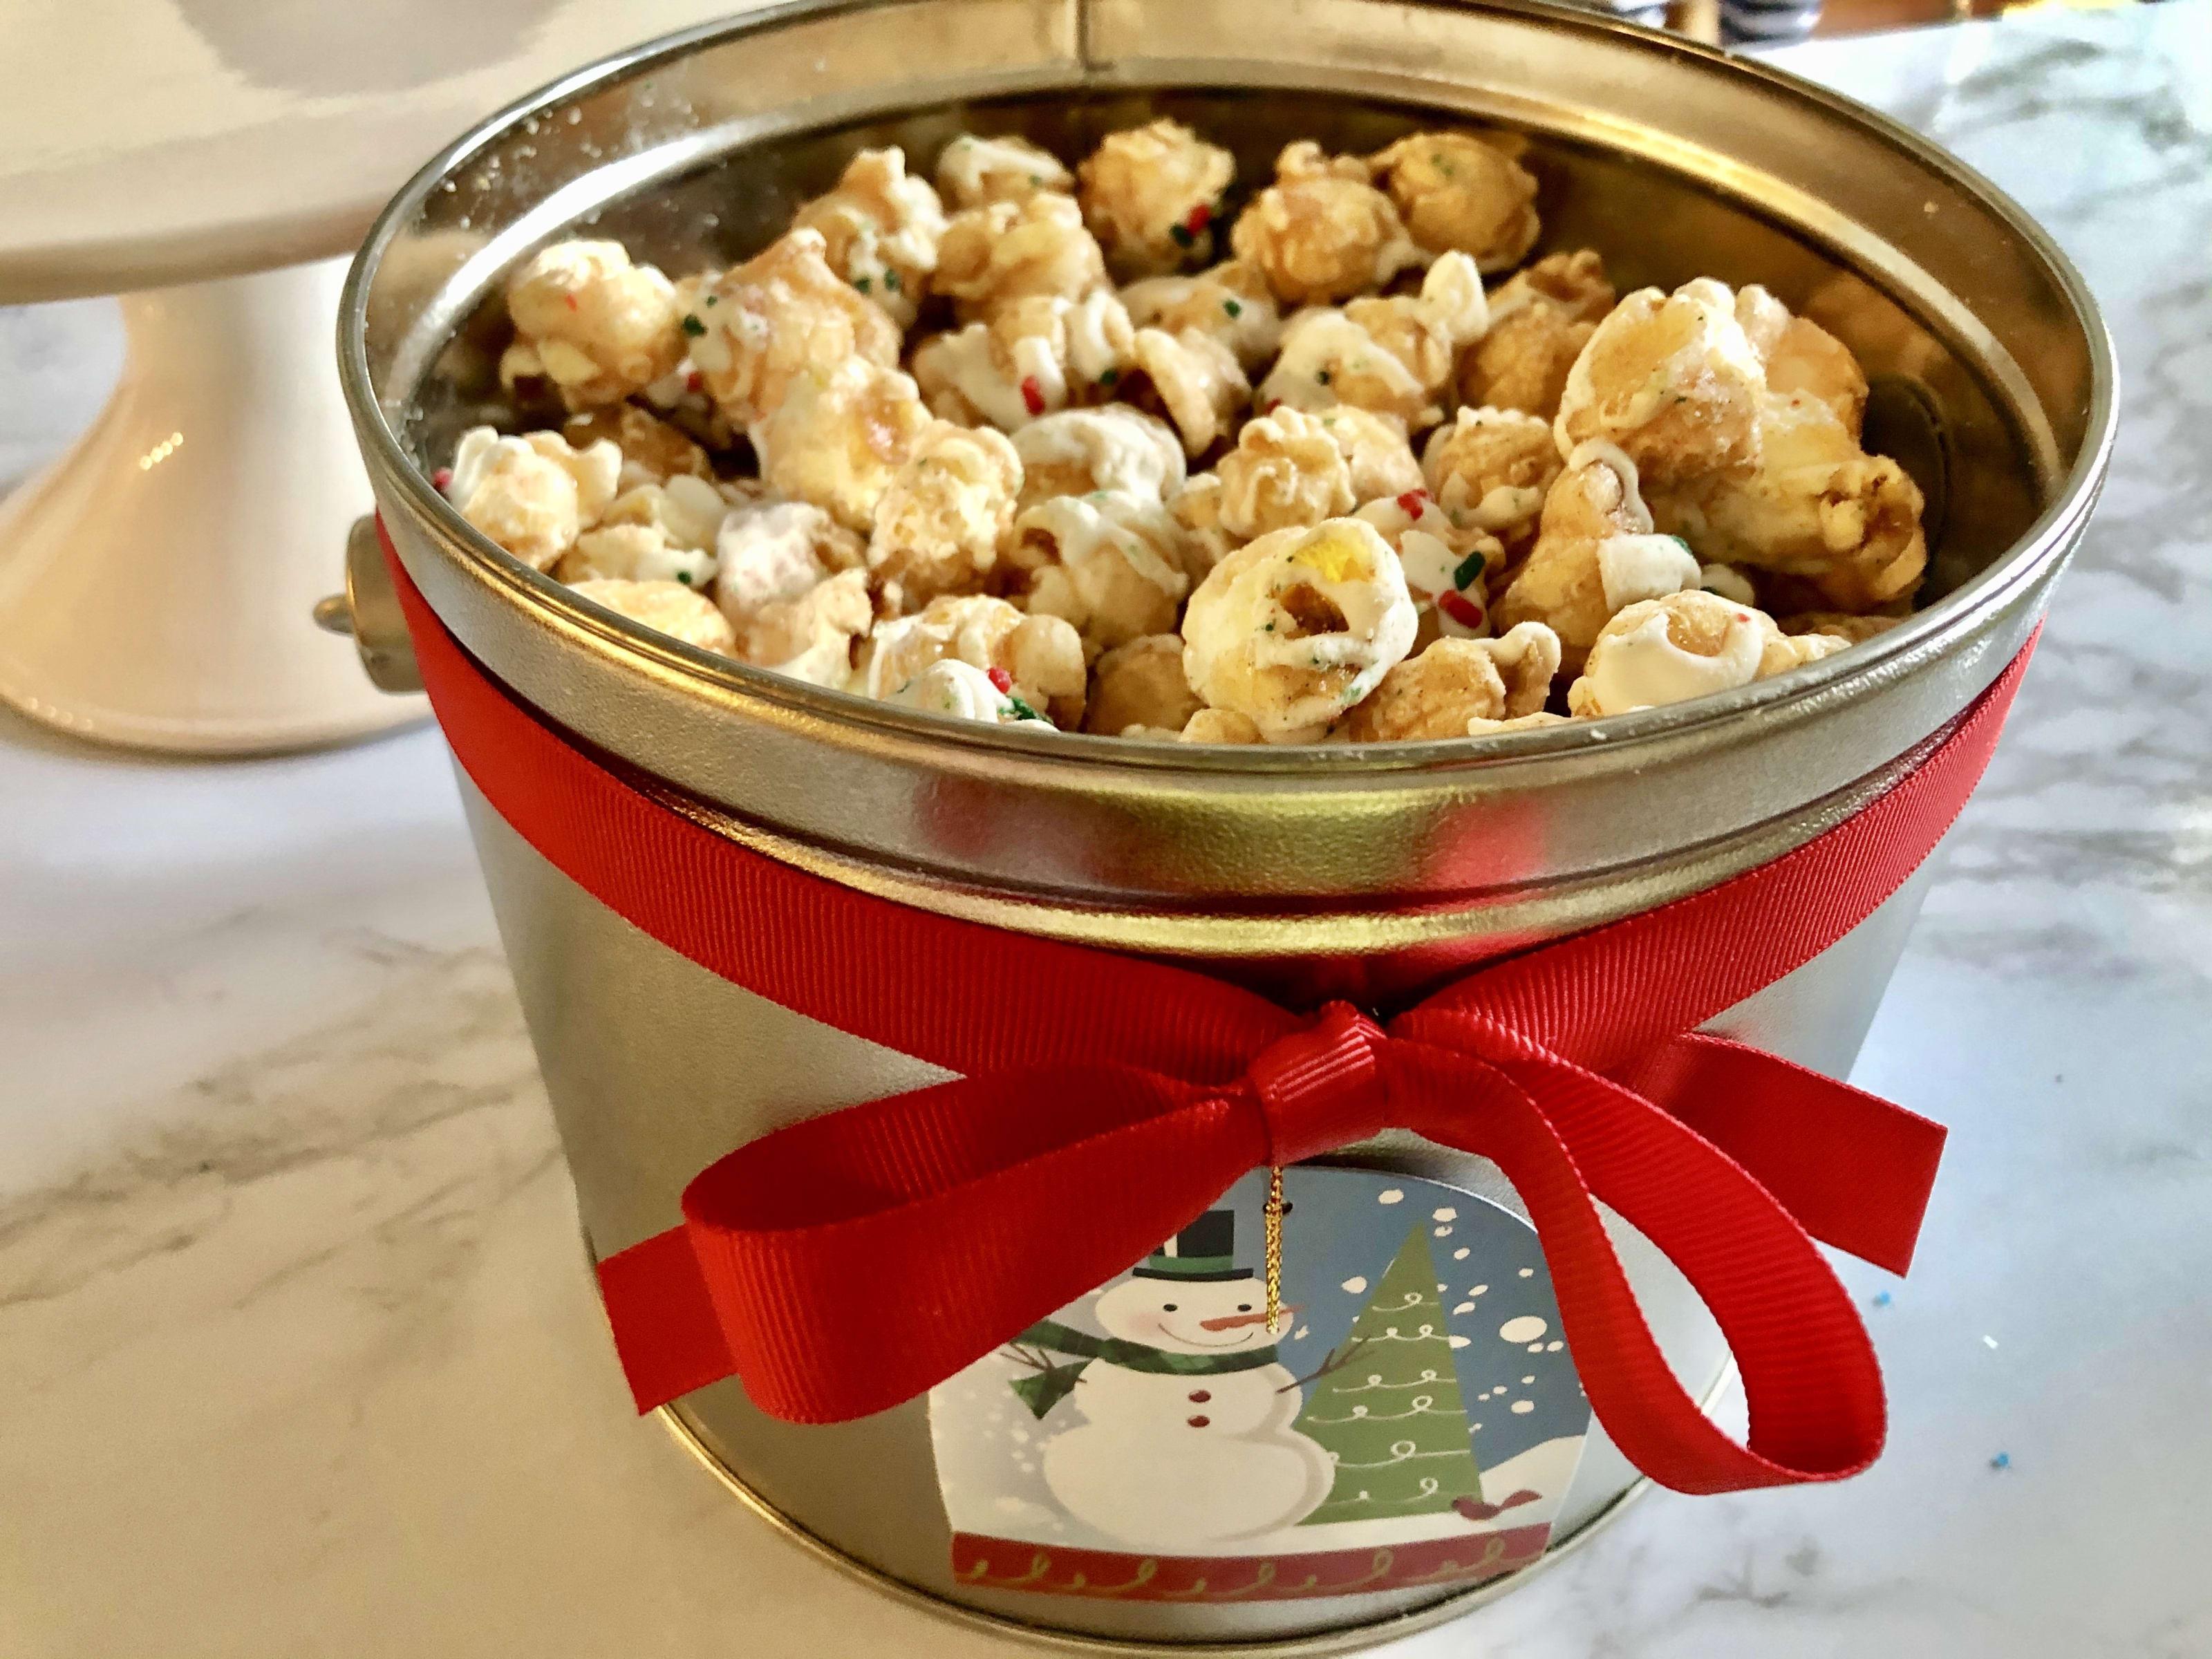 Magical Holiday Popcorn Pail